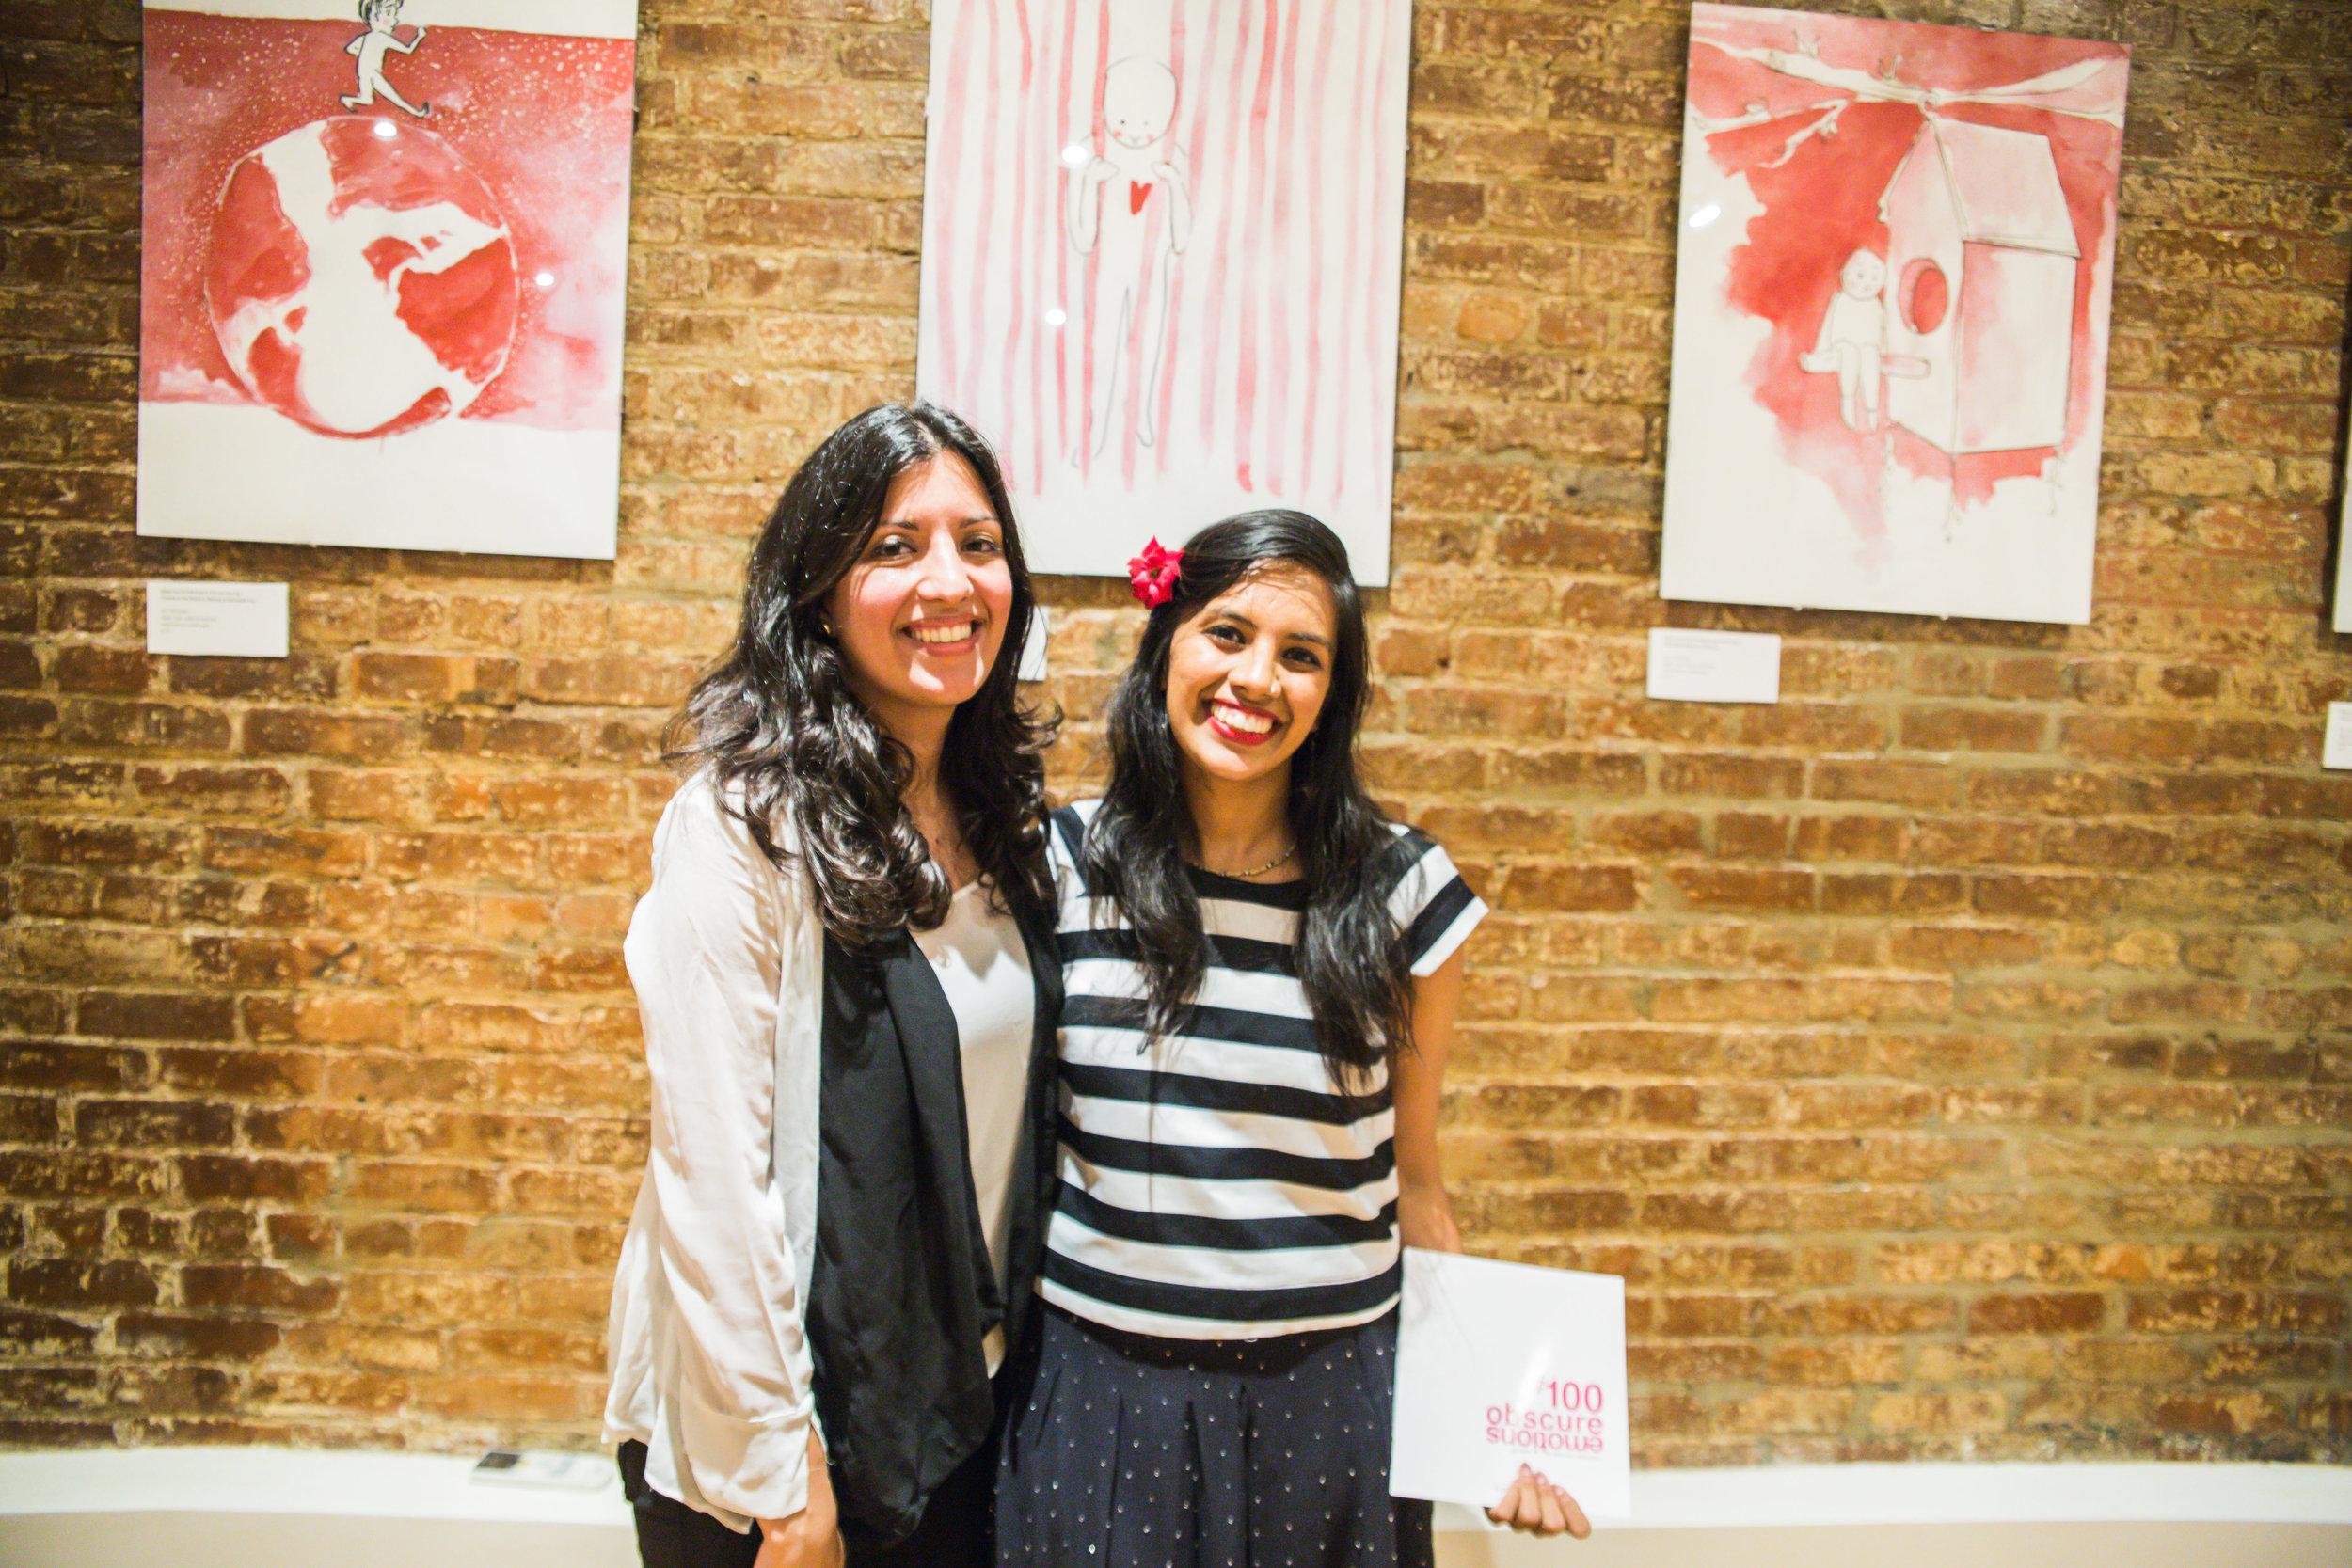 Rukmini Poddar (Right) and her friend and curator, Radhika Kosharay (Left)